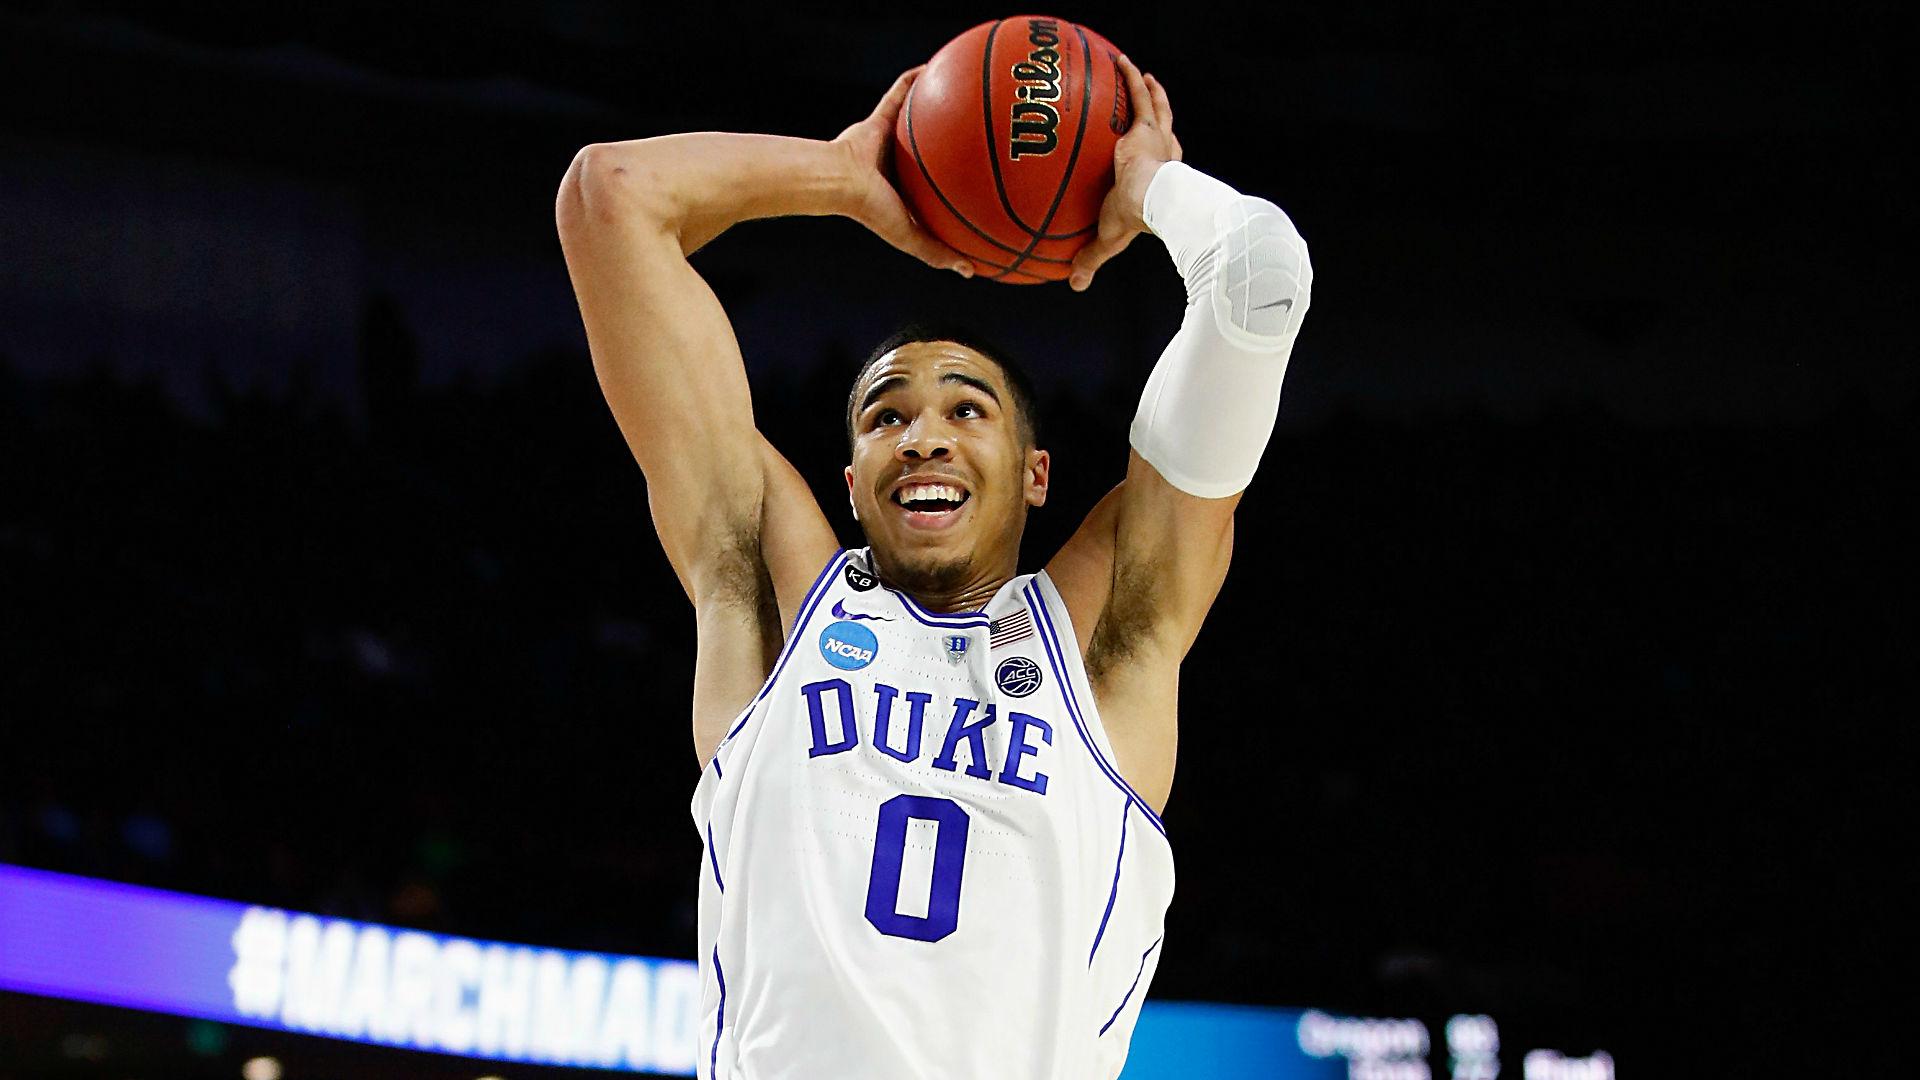 2017 NBA Draft: Duke freshman Jayson Tatum turning pro | NBA | Sporting News